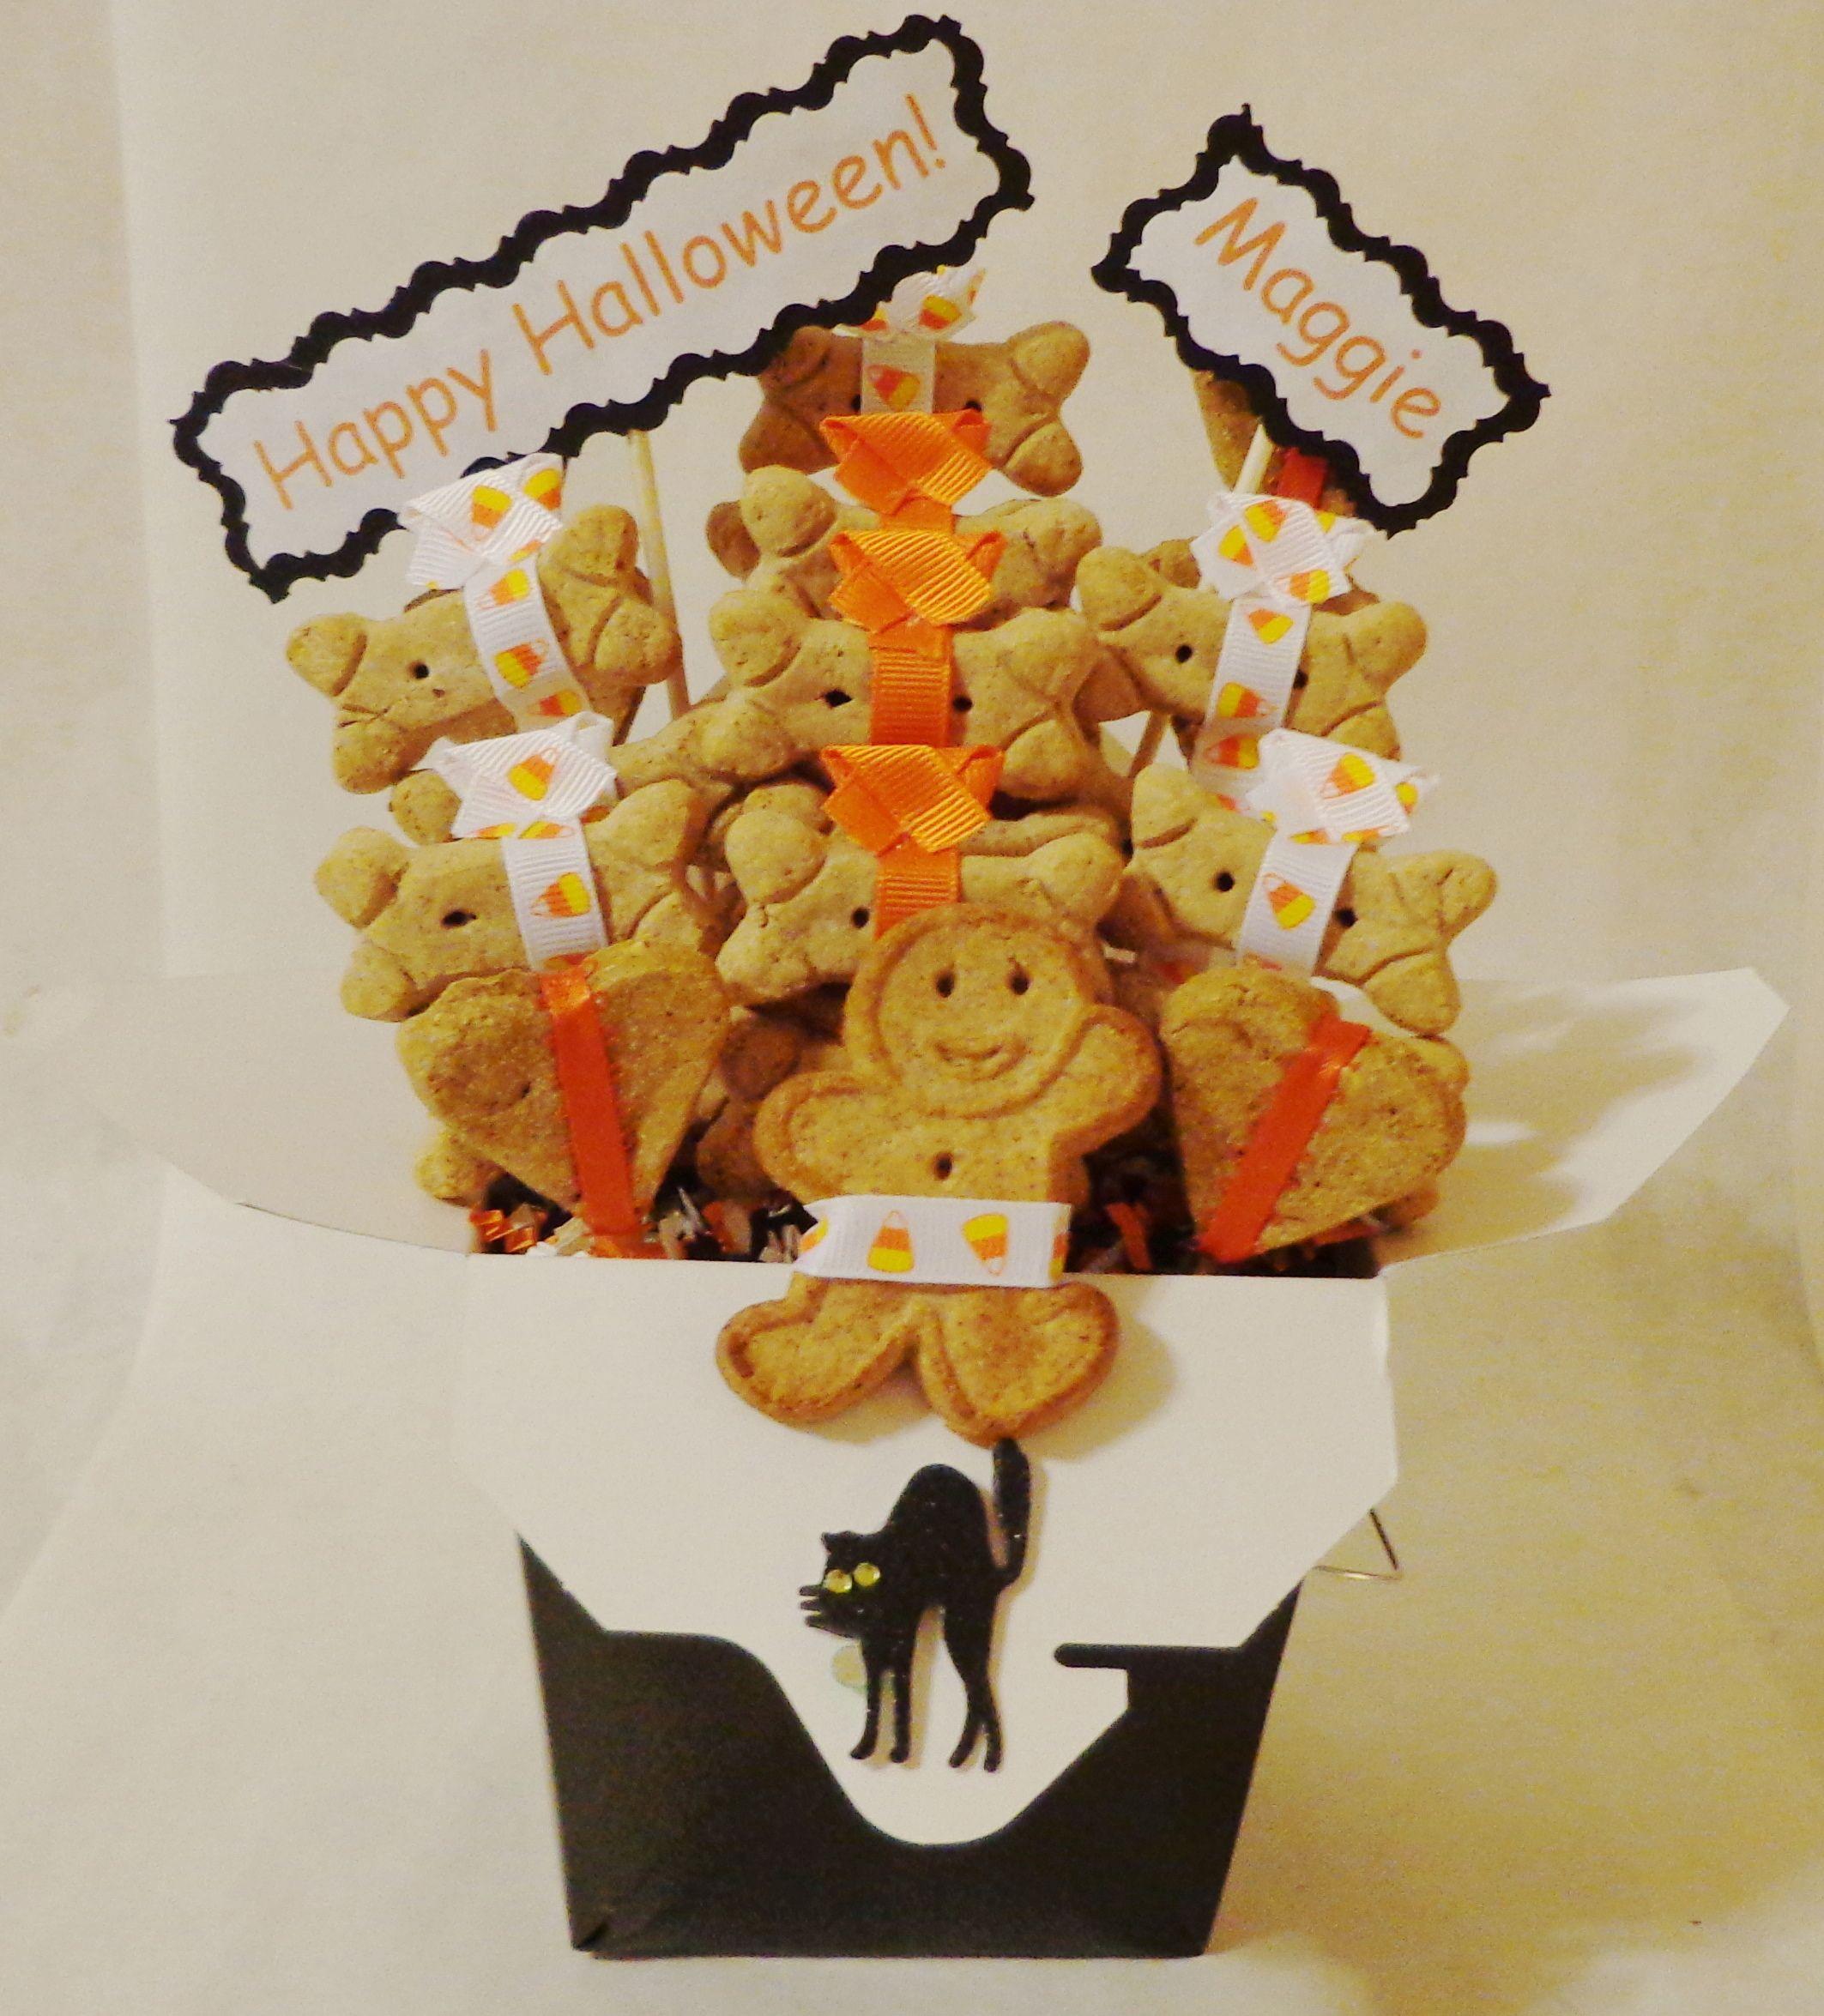 Custom Halloween dog treat gift basket. Use code